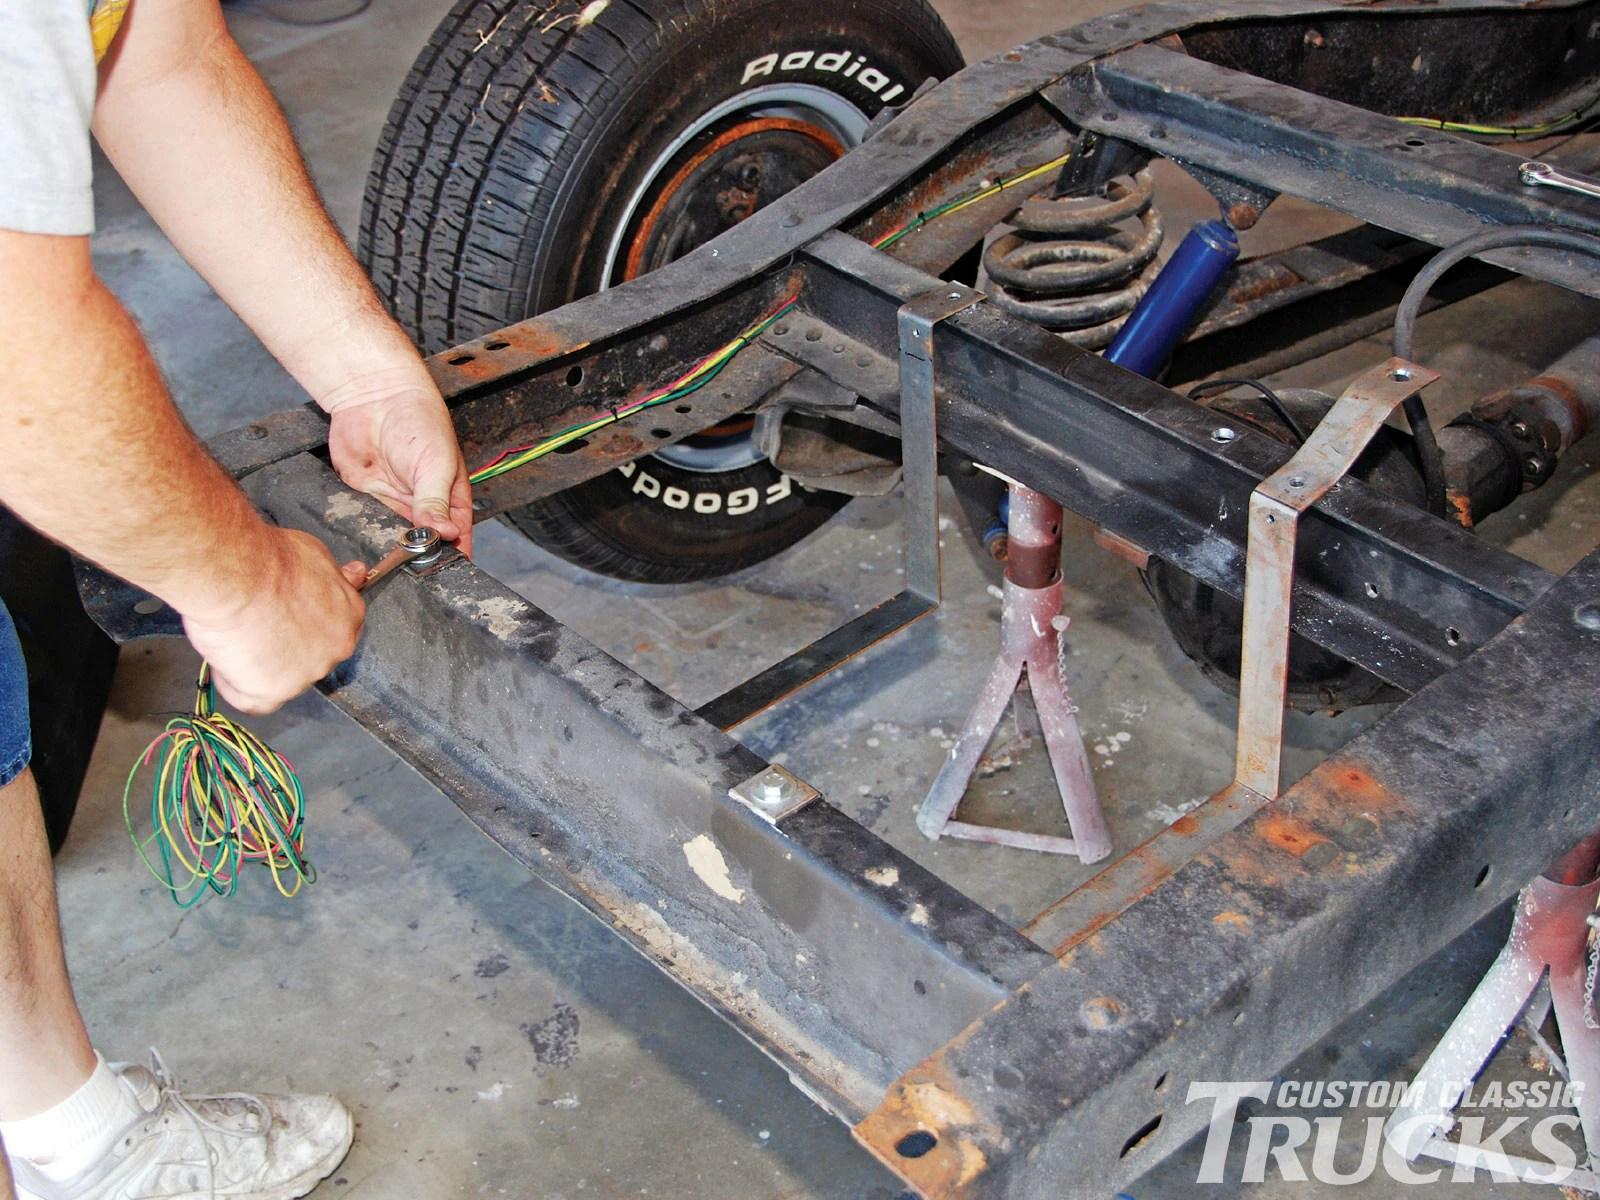 1956 Dodge Truck Wiring Diagrams Chevrolet C10 External Fuel Tank Install Hot Rod Network